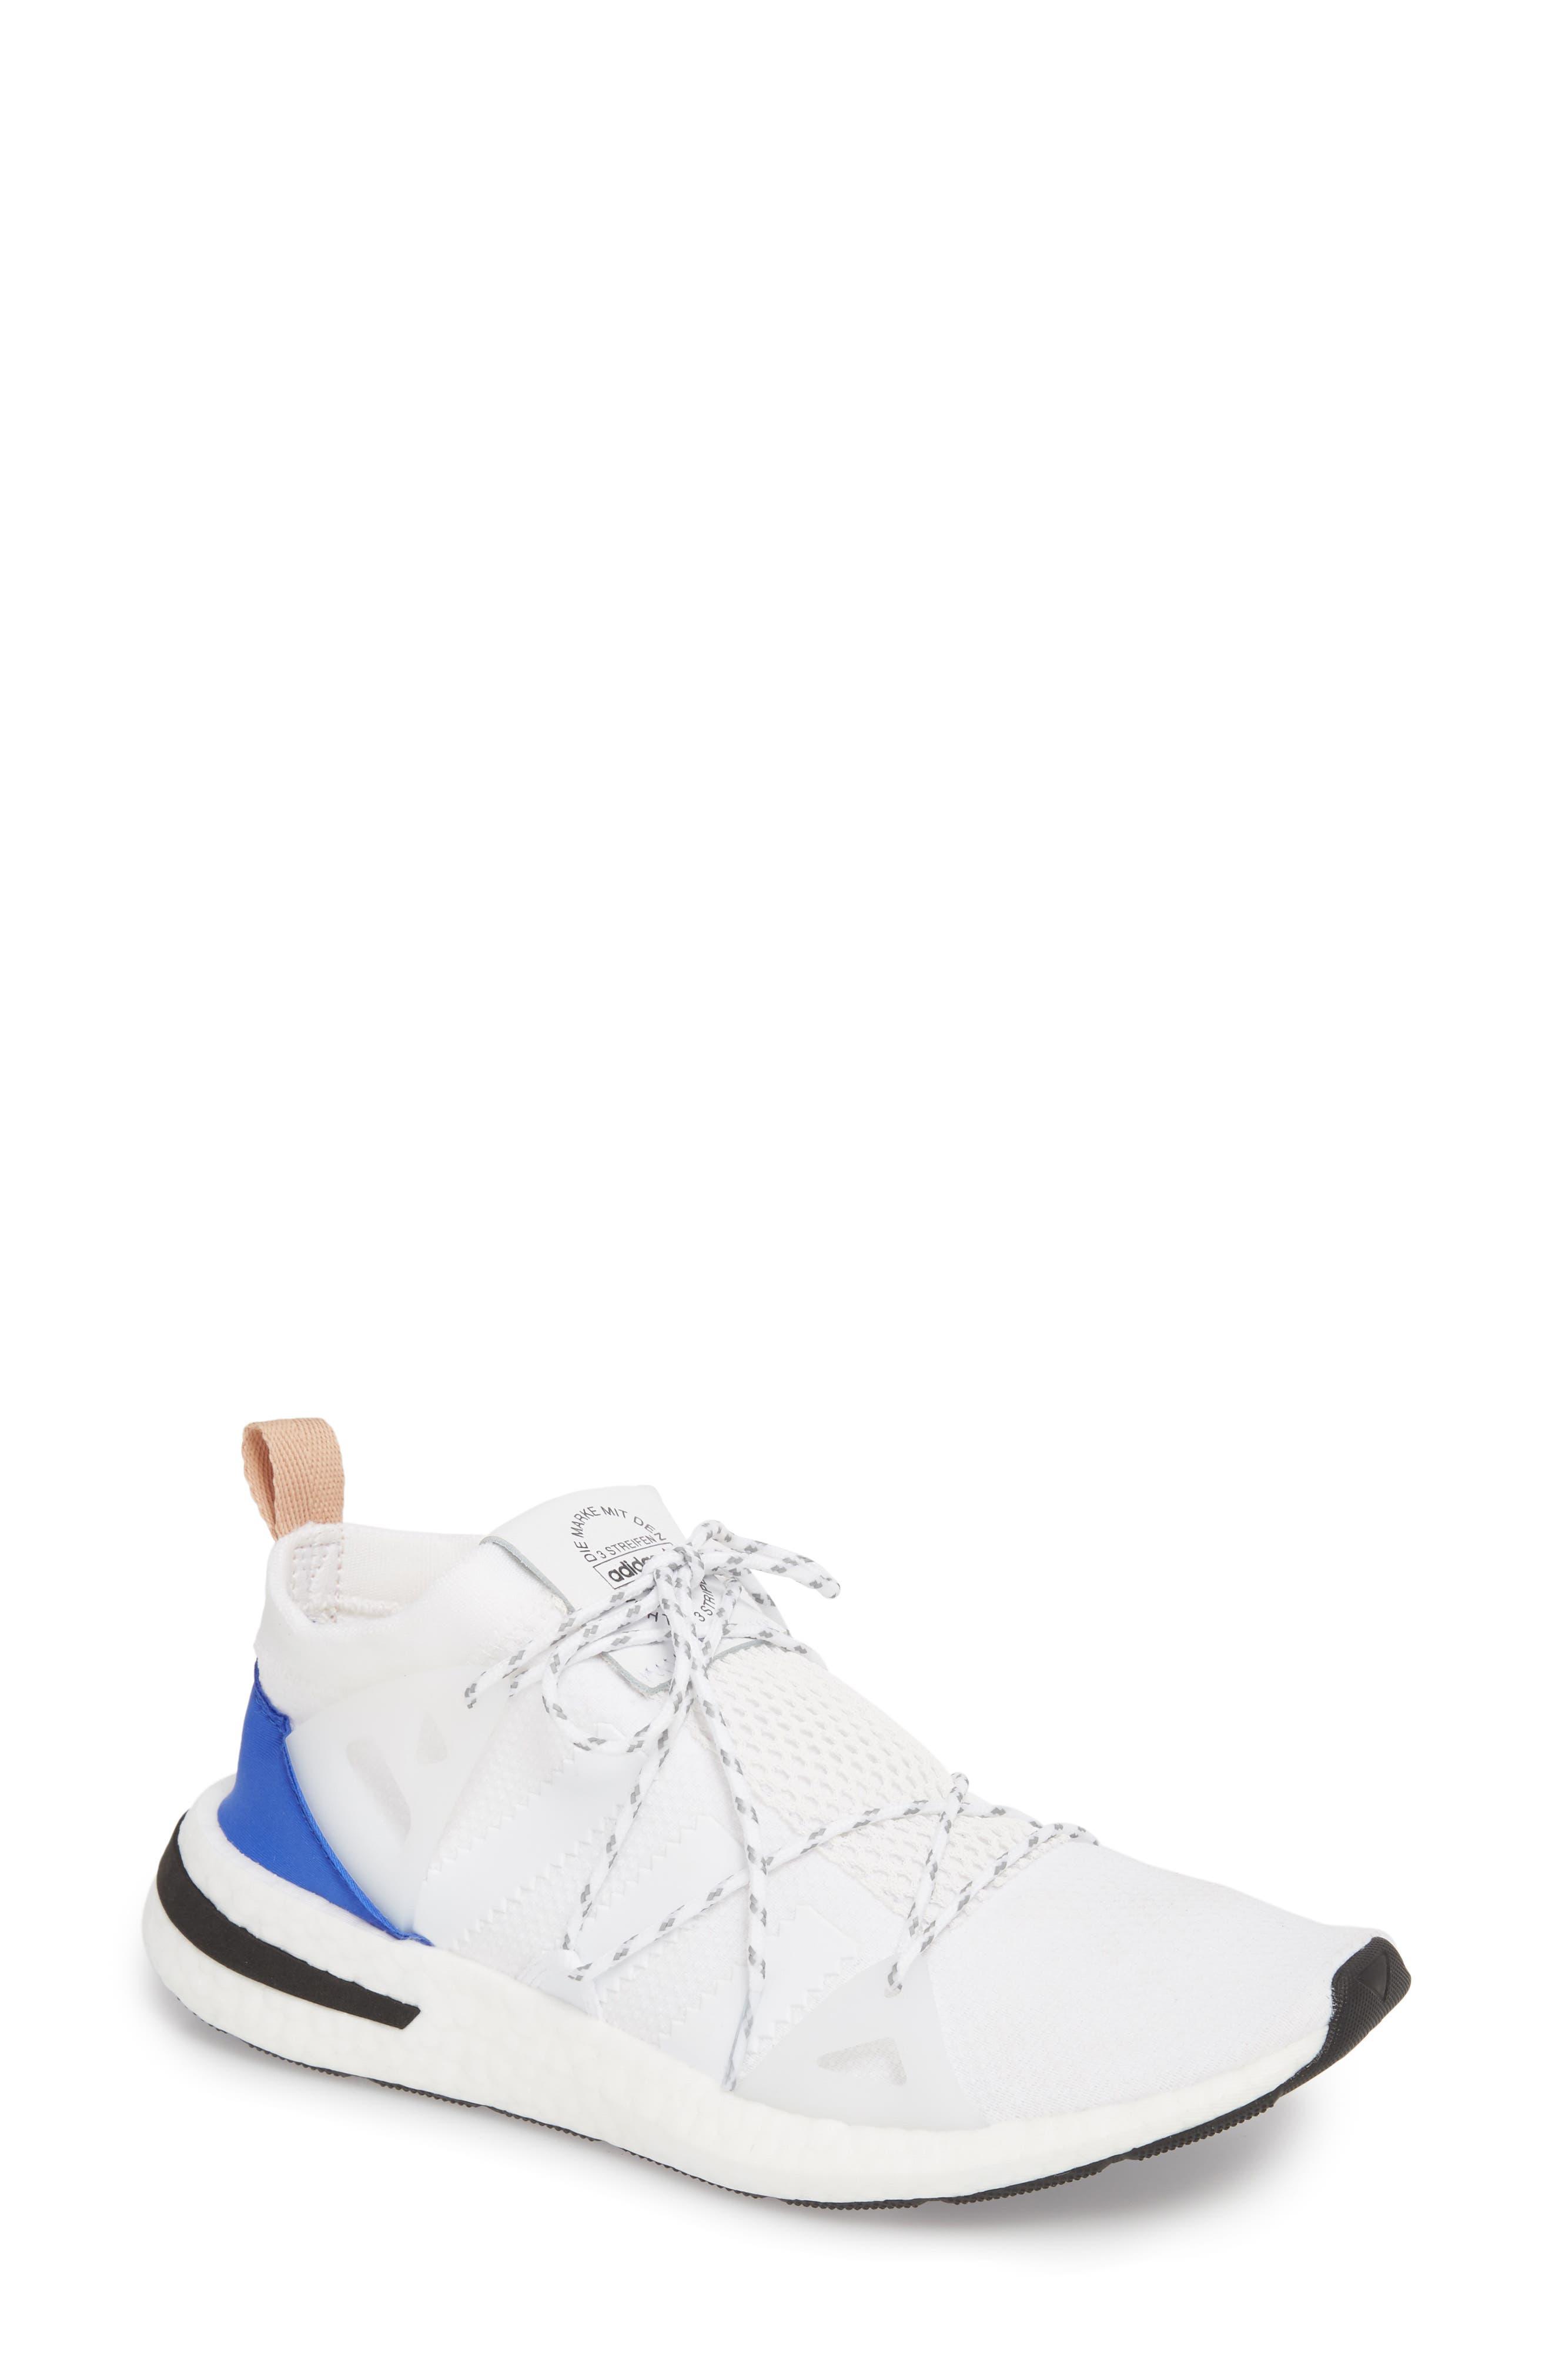 Arkyn Sneaker,                         Main,                         color, White/ White/ Ash Pearl